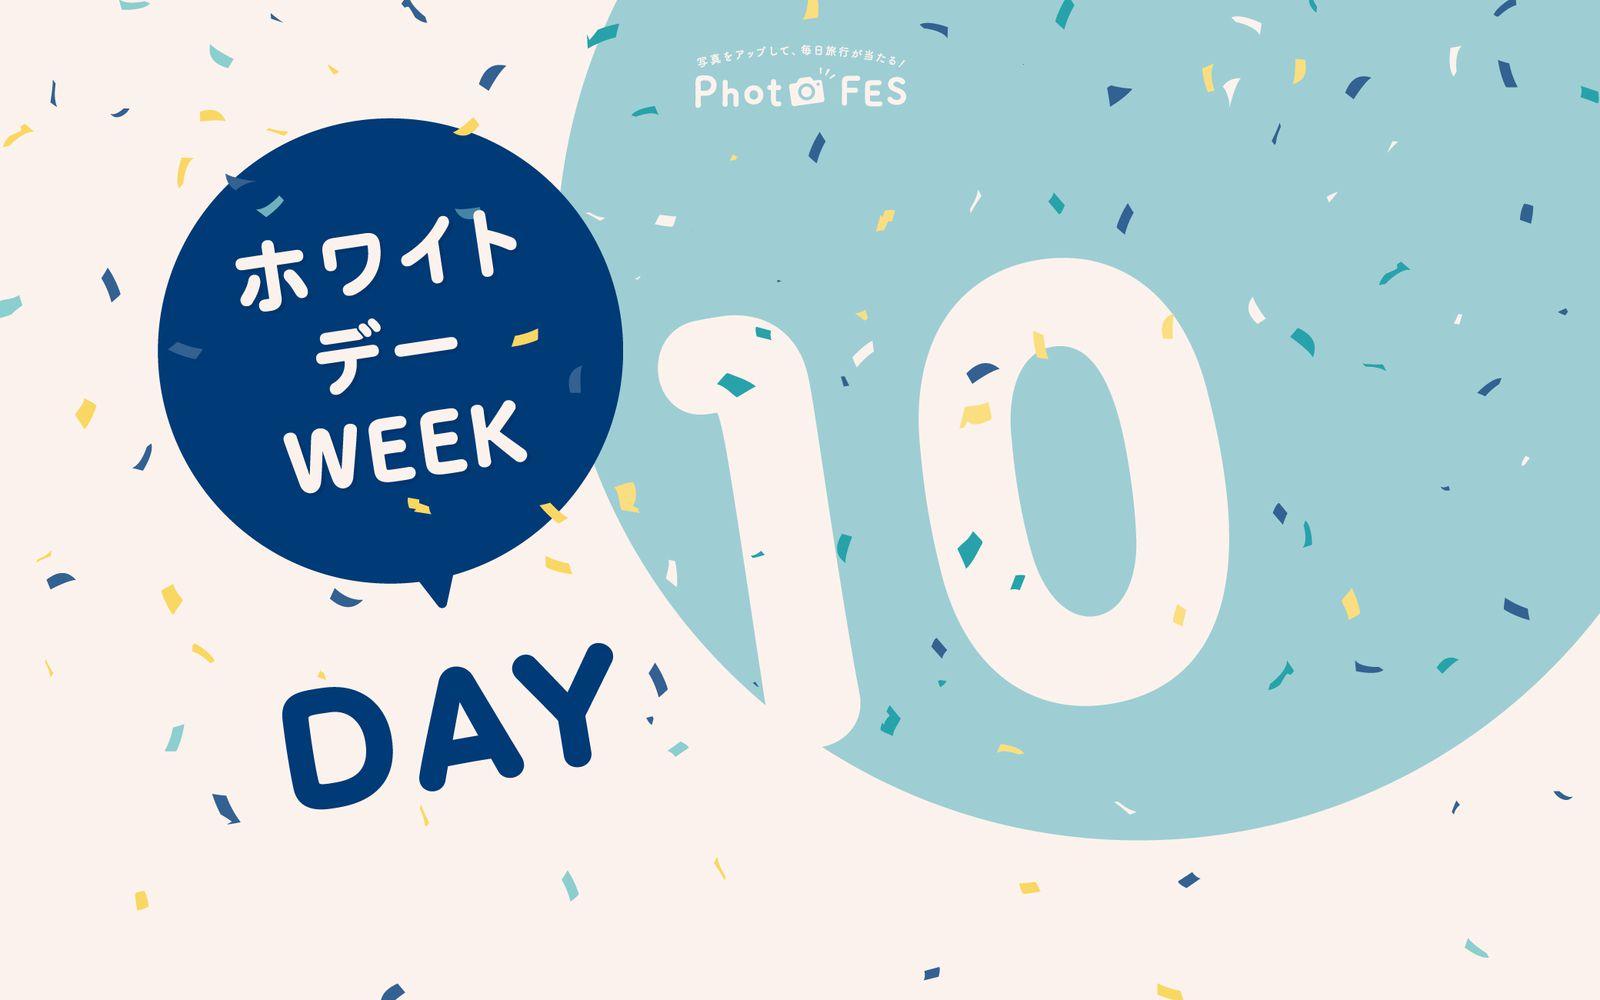 【DAY10】「Photo FES ホワイトデーWEEK」2月24日投稿分であたる賞品&受賞者発表